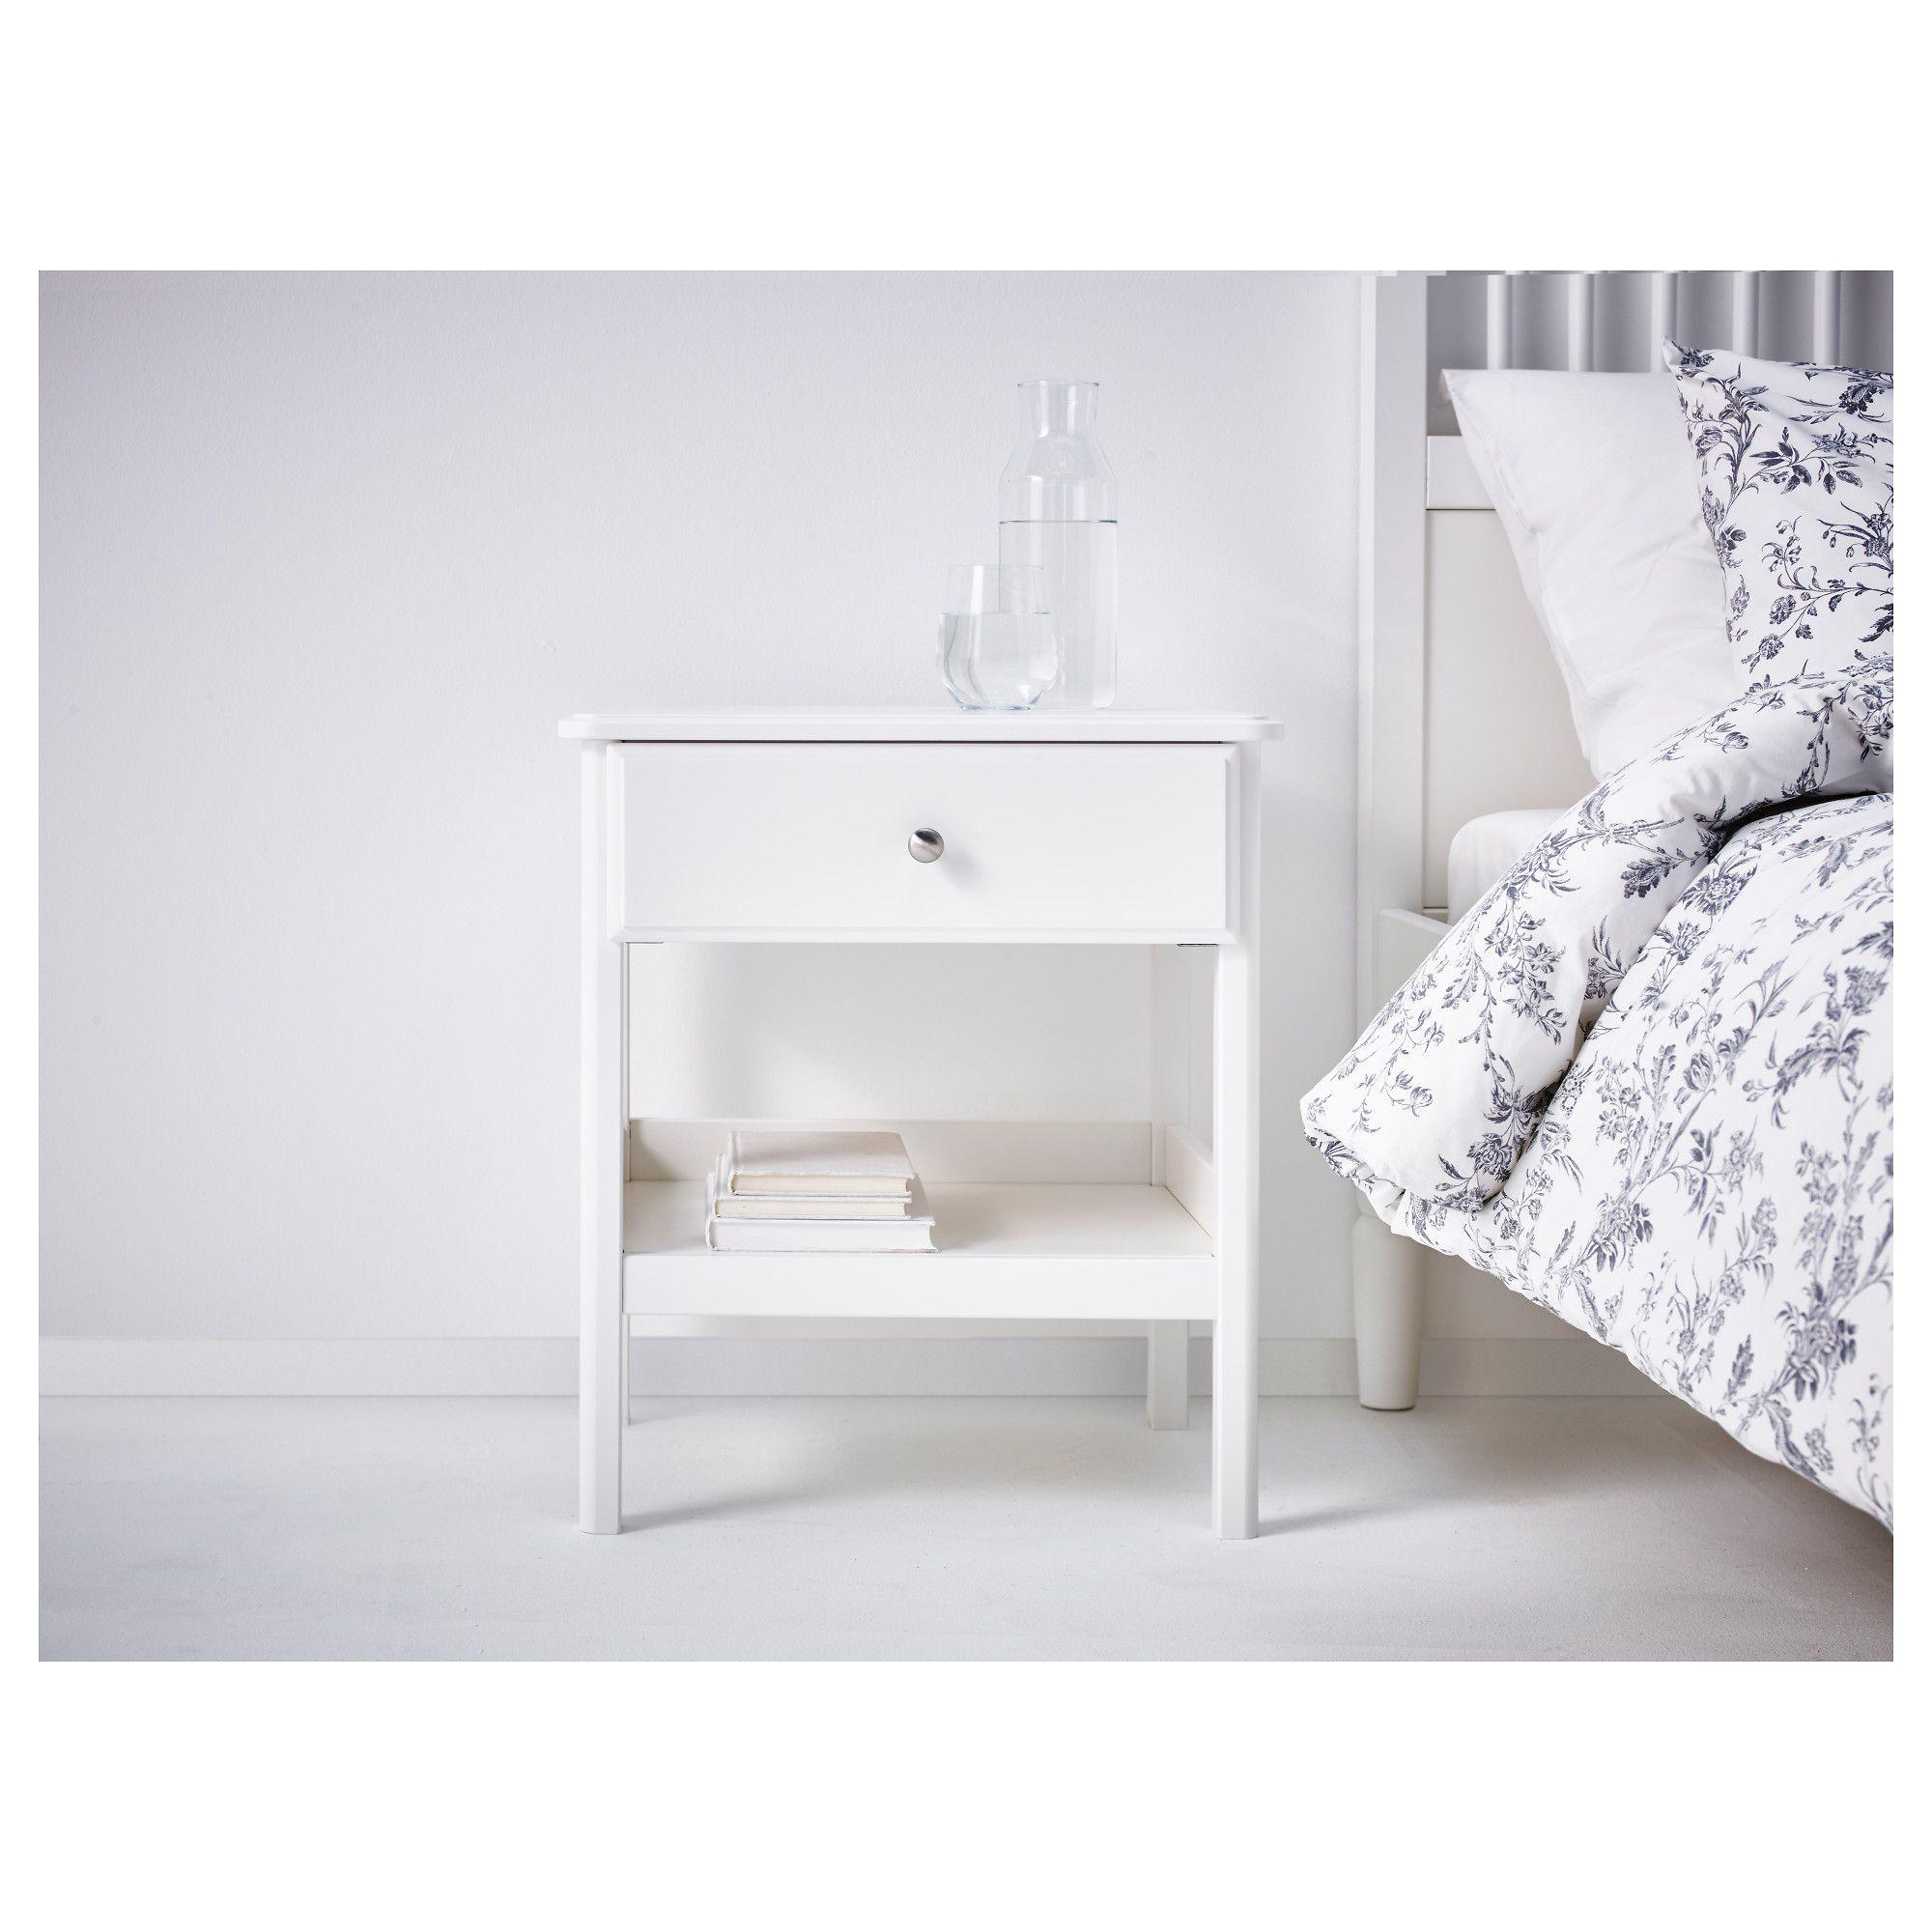 Tyssedal Bedside Table White Ikea In 2019 Bedside Table